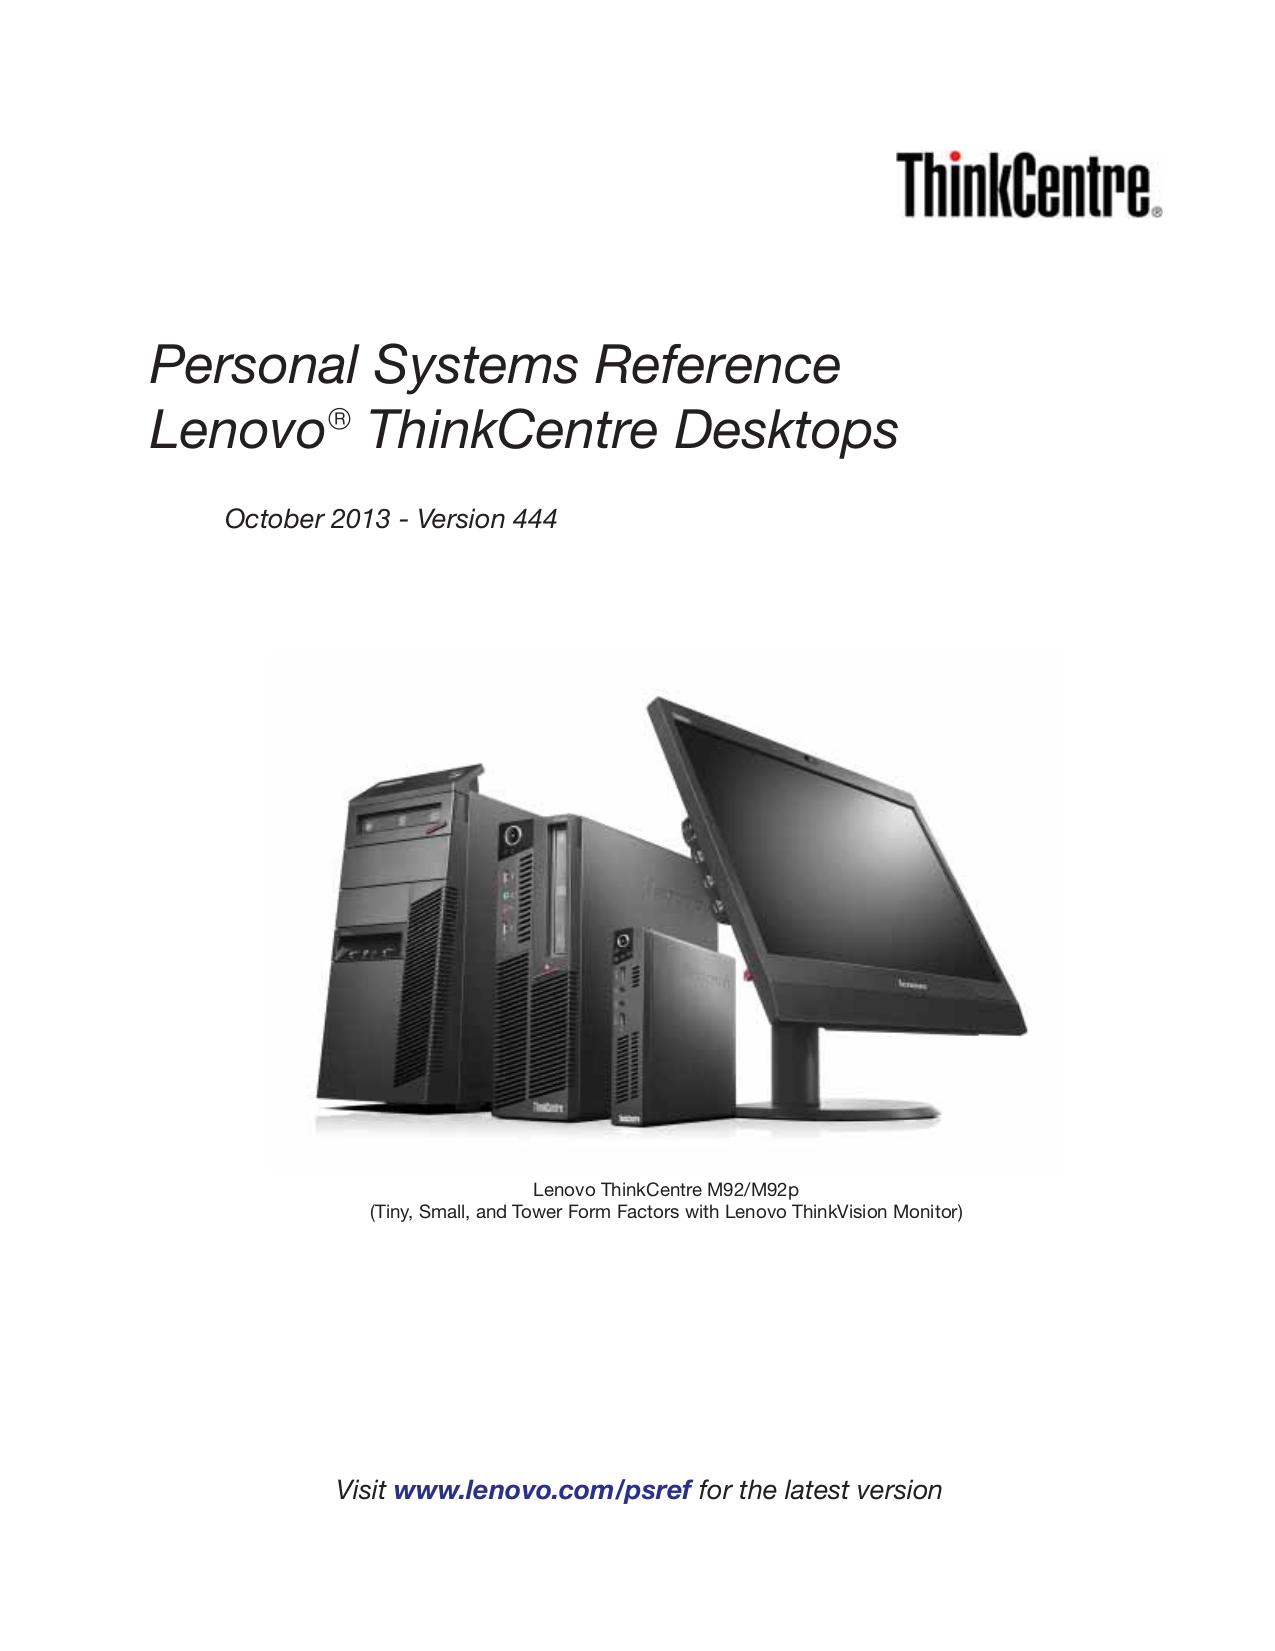 pdf for Lenovo Desktop ThinkCentre M58 4099 manual